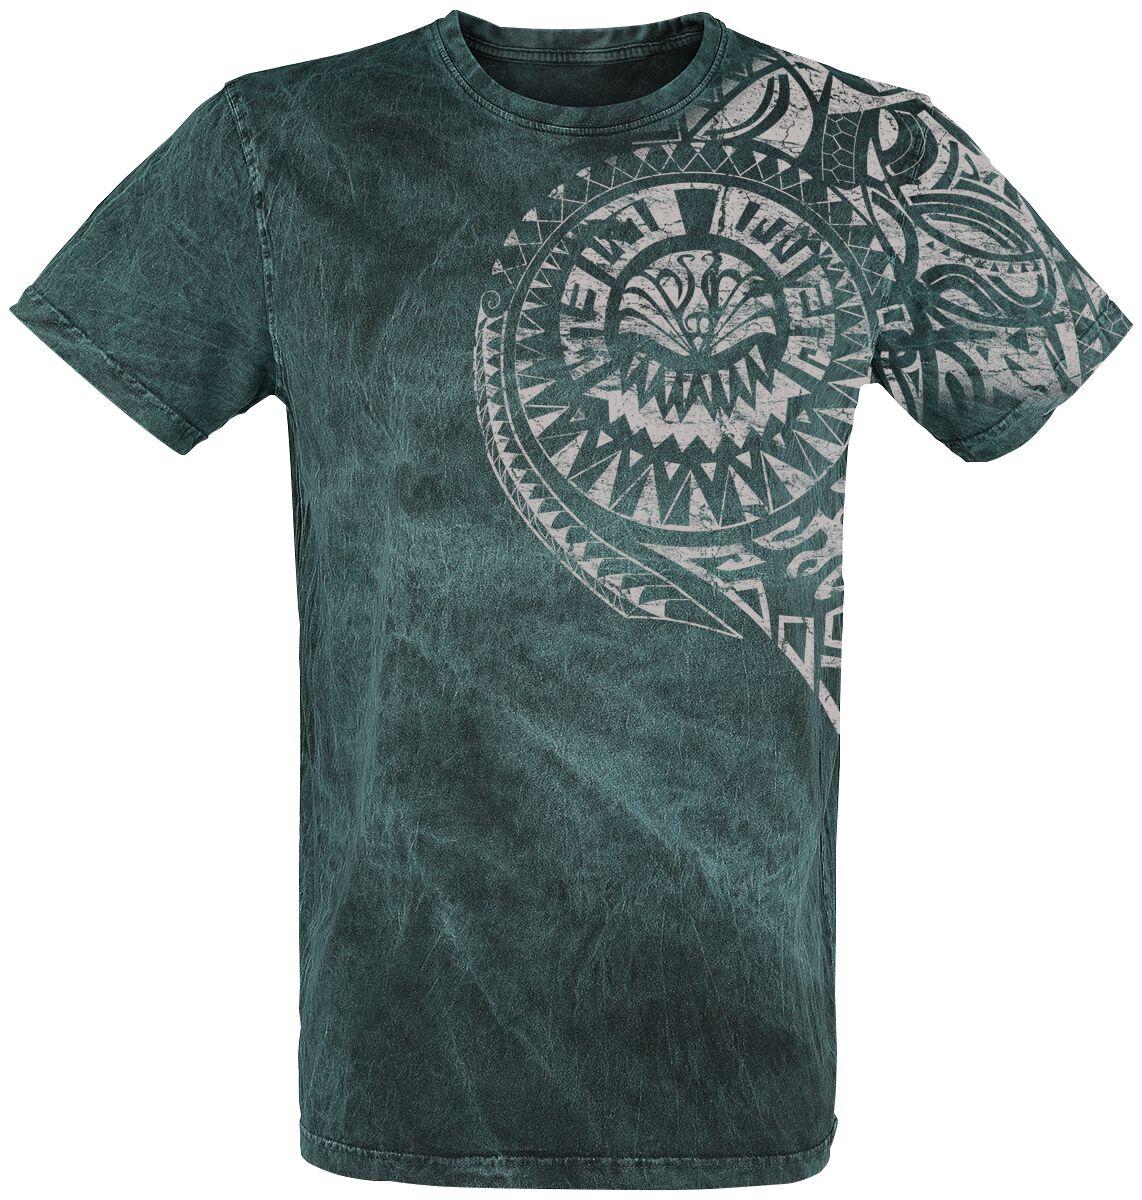 Image of   Outer Vision Burned Tattoo T-Shirt blå